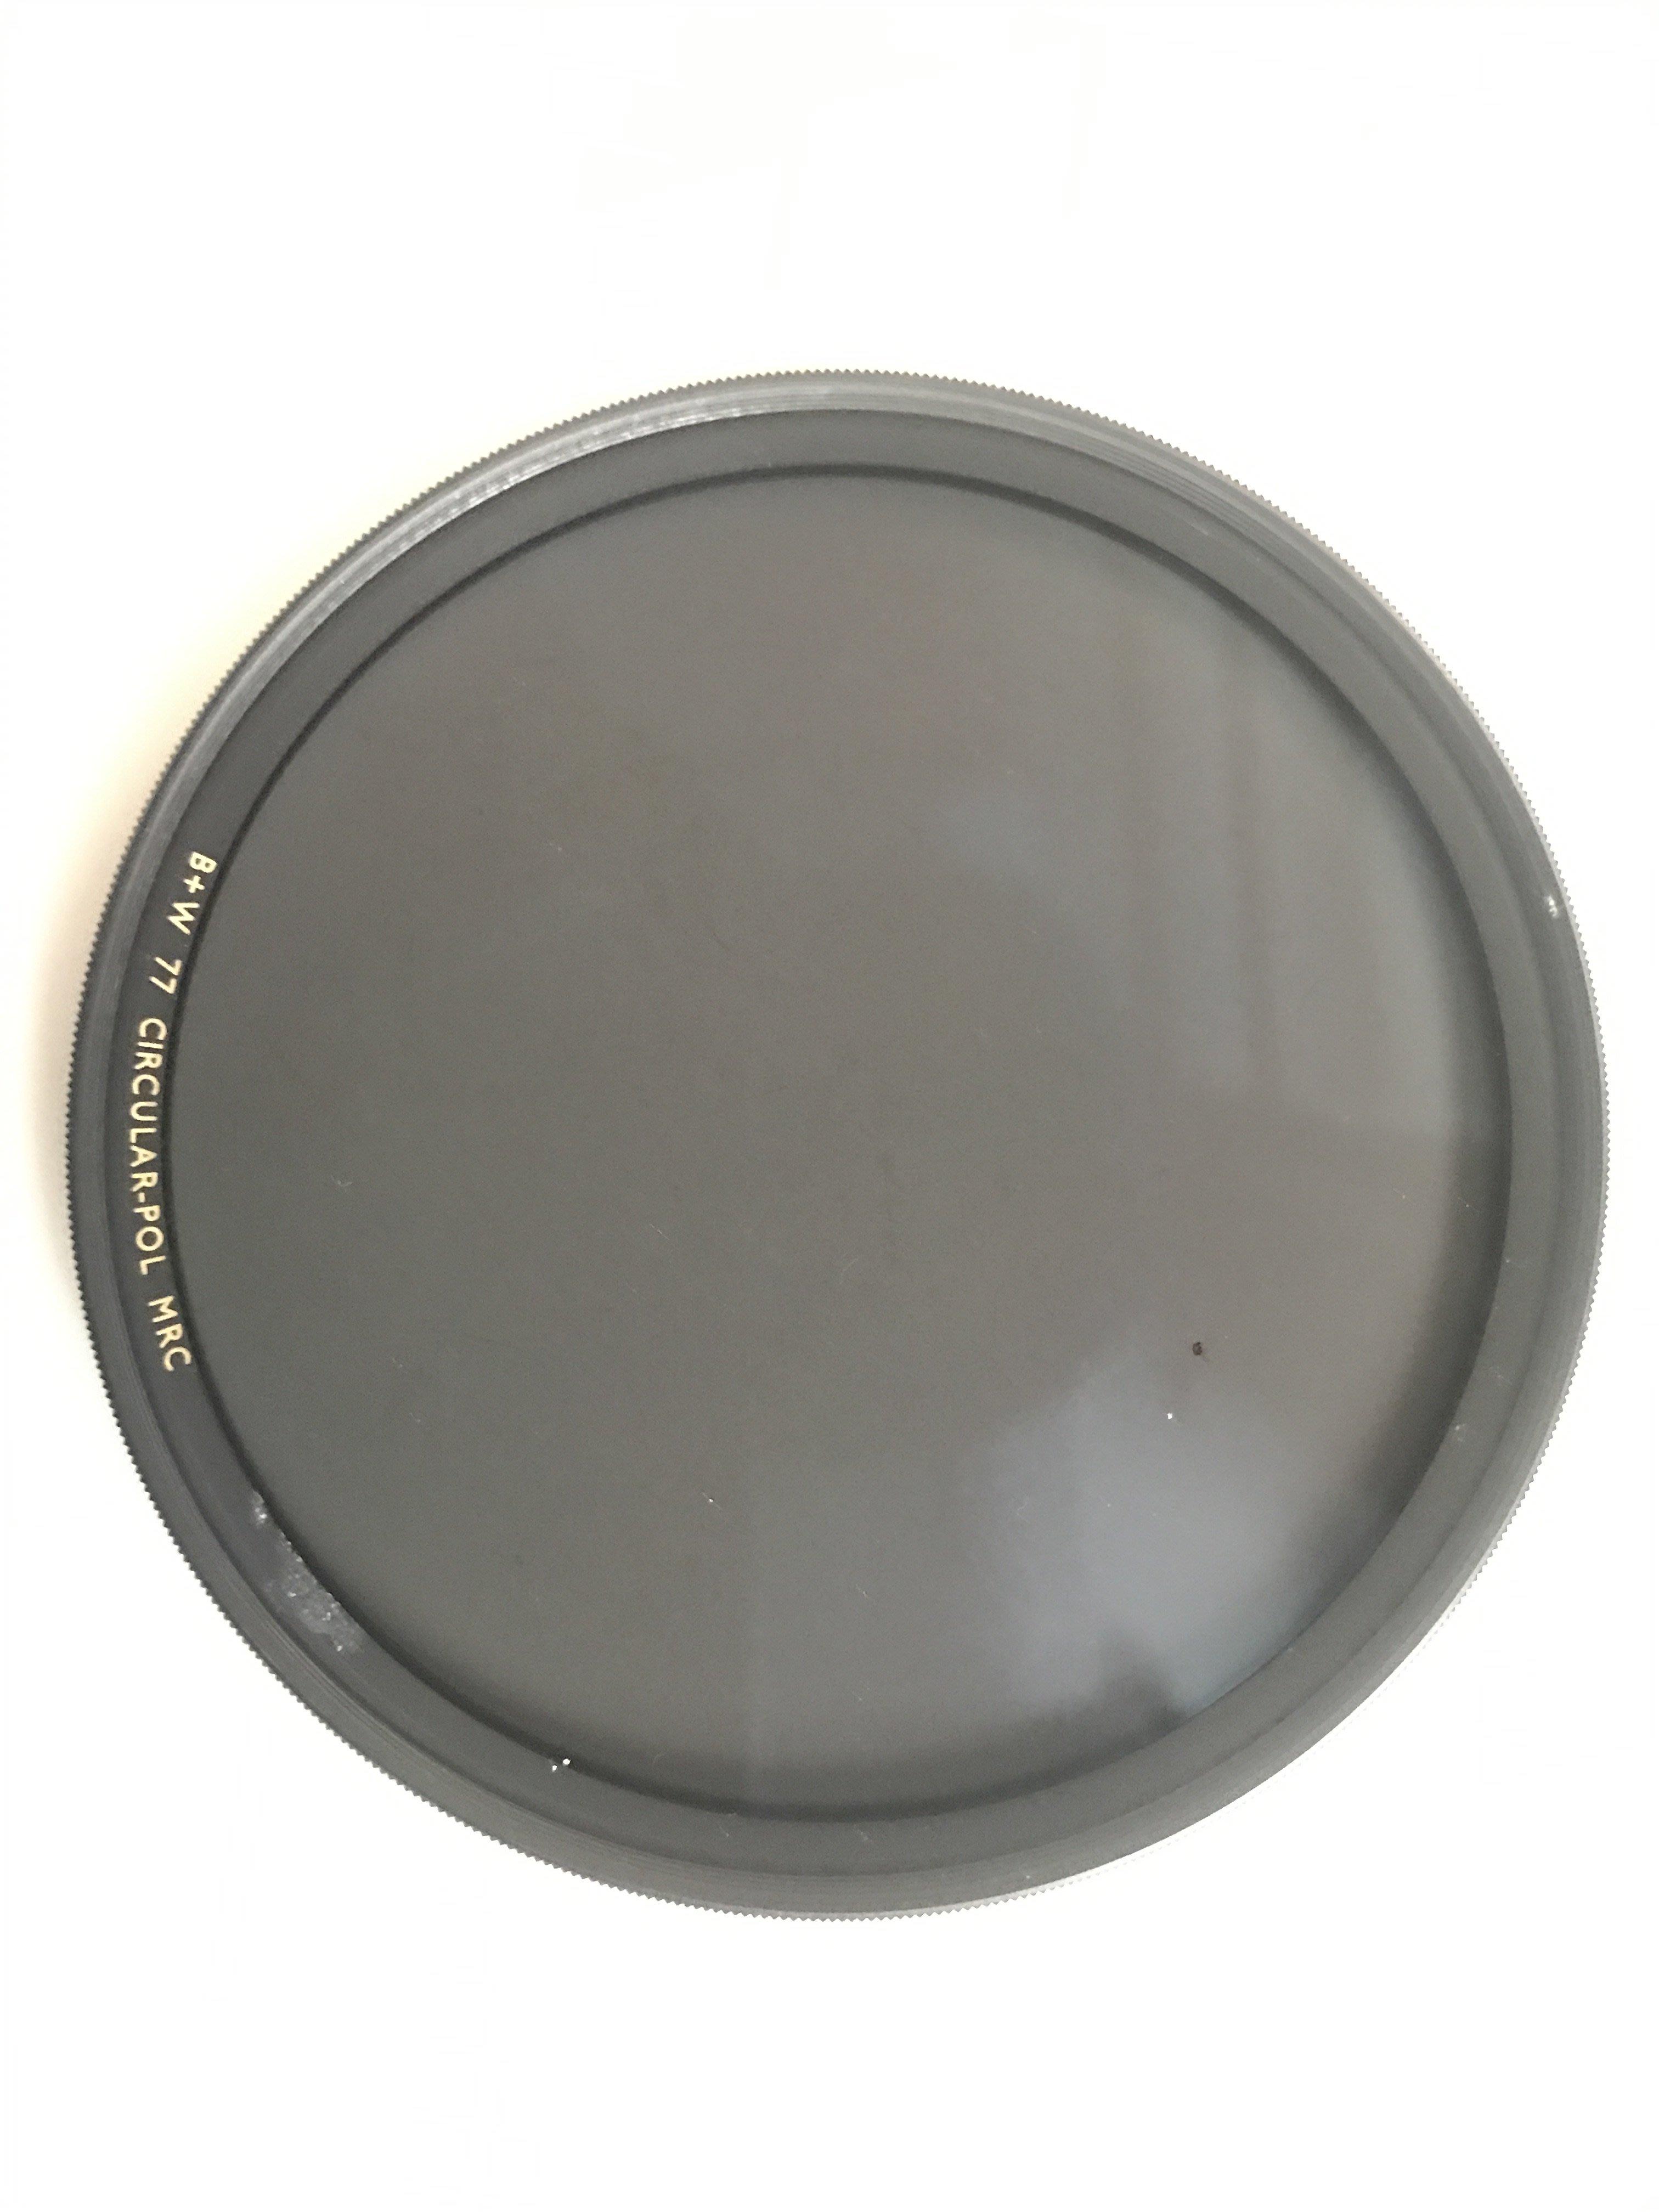 B+W 77 Circular-pol mrc 偏光鏡